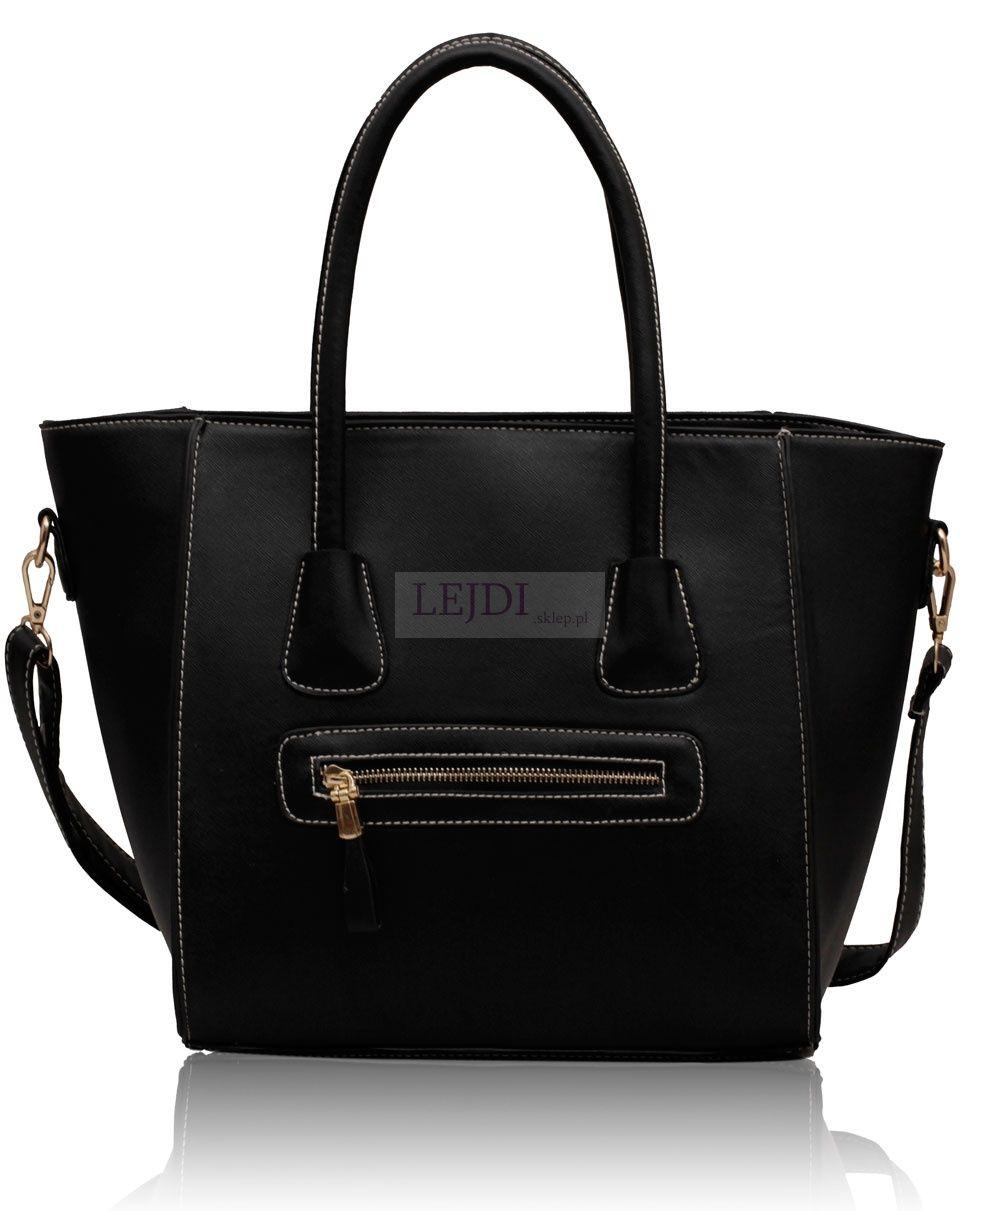 b469f16a3e37d Czarna torba w stylu Celine - Miley Cyrus